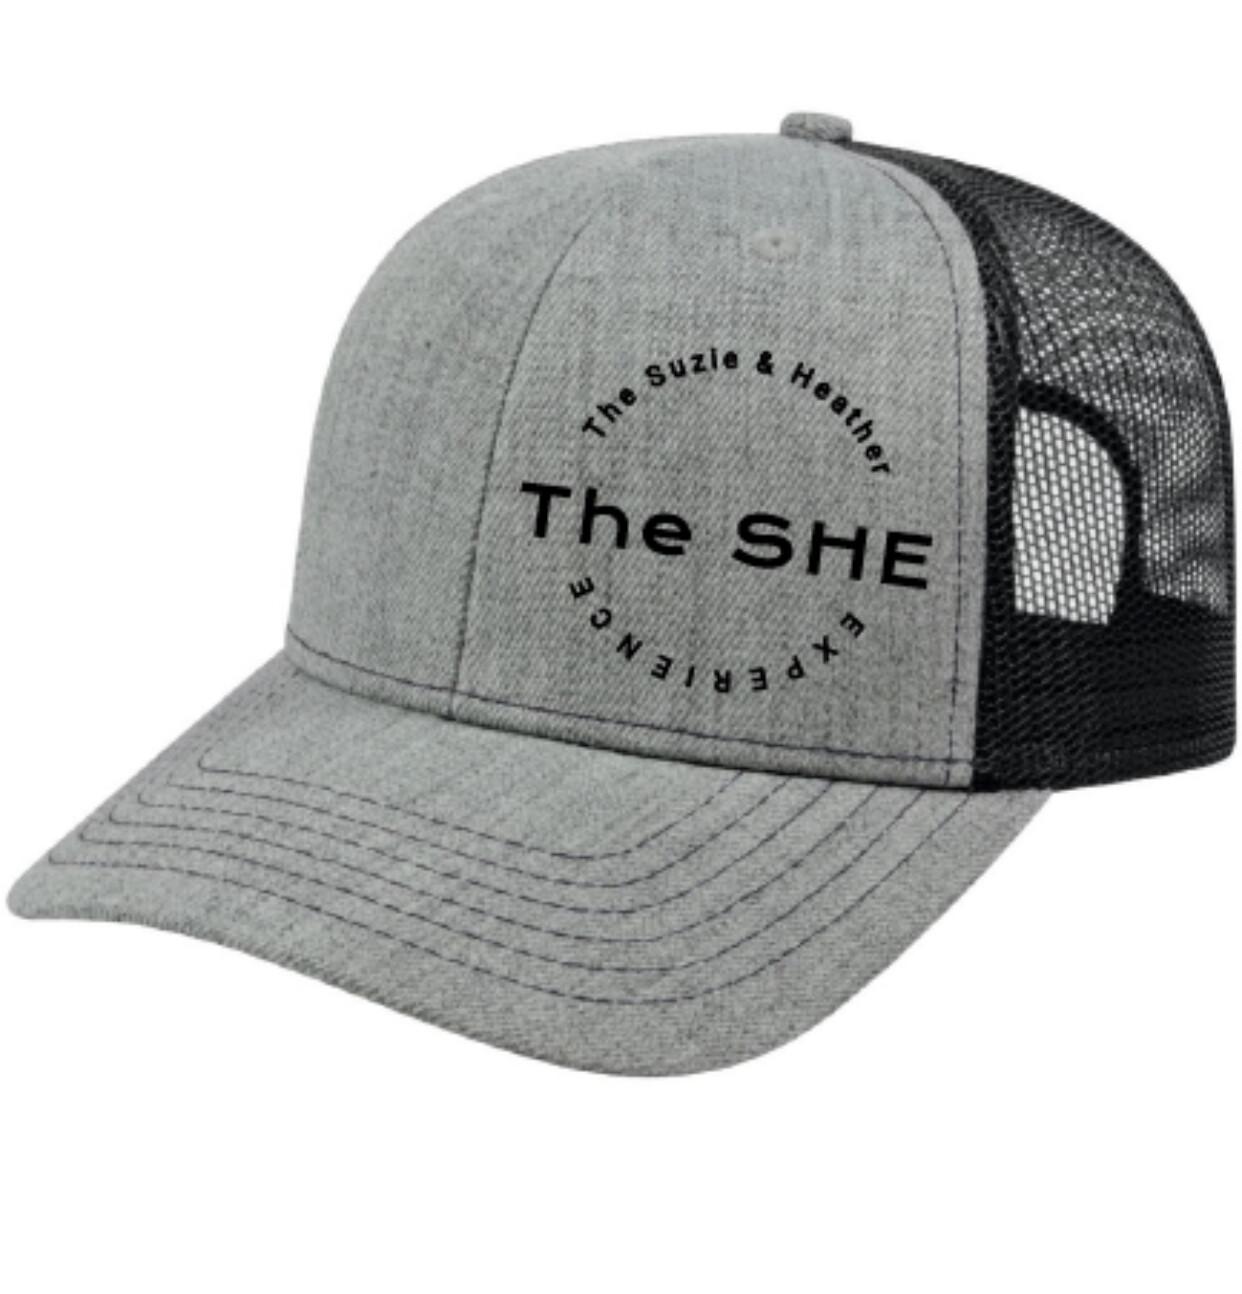 The SHE Classic Cap Grey/Black